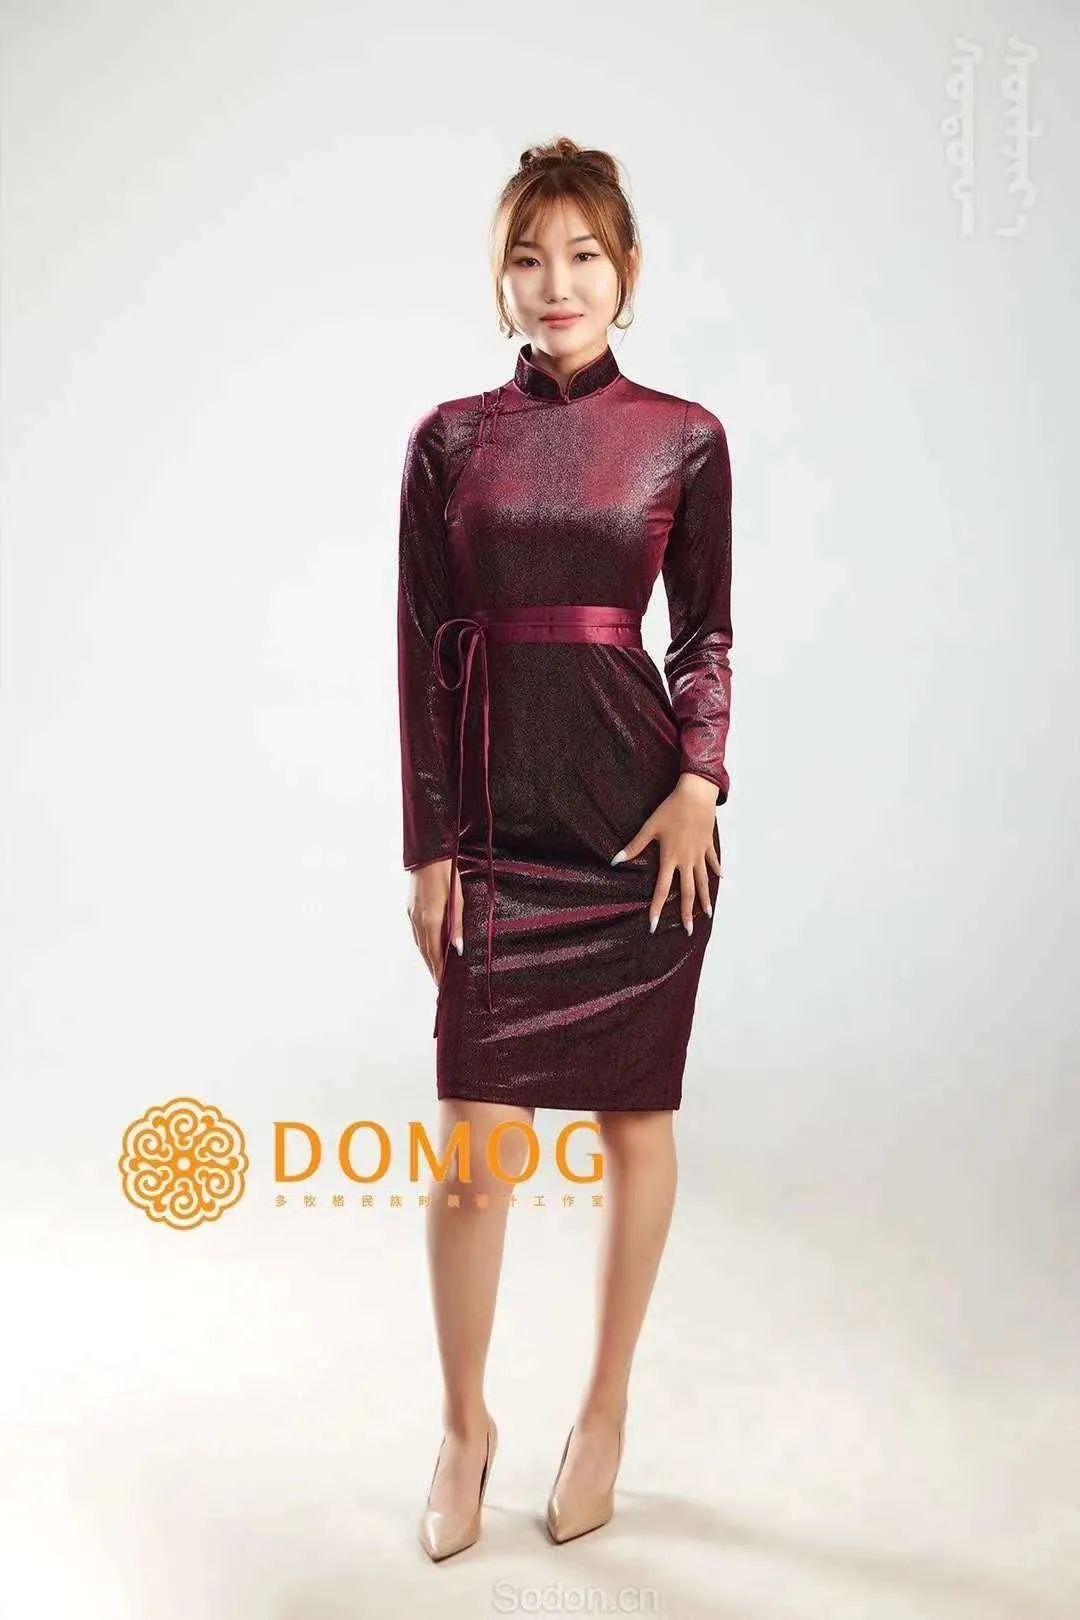 DOMOG 蒙古时装2020新款,民族与时尚的融合 第47张 DOMOG 蒙古时装2020新款,民族与时尚的融合 蒙古服饰